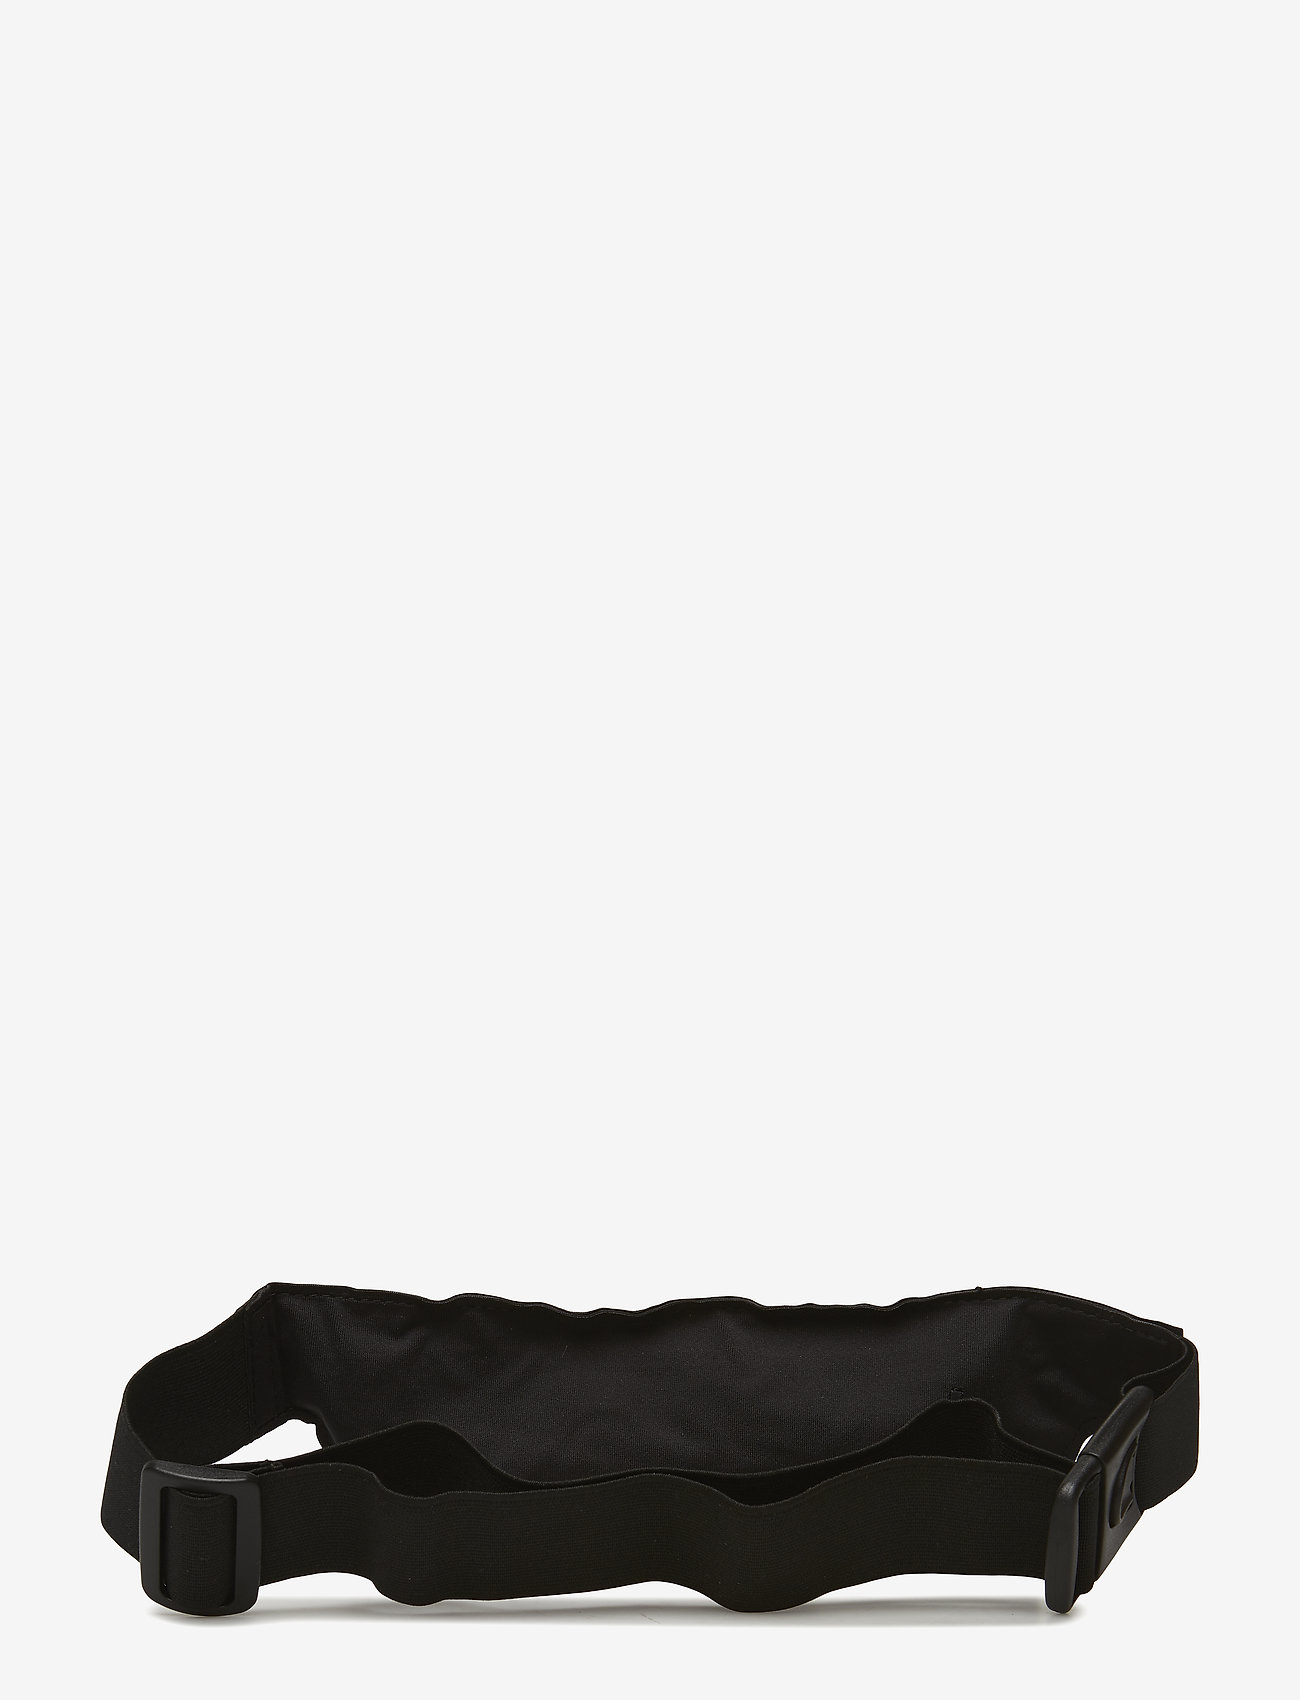 2XU - RUN BELT - andet - black/black - 1